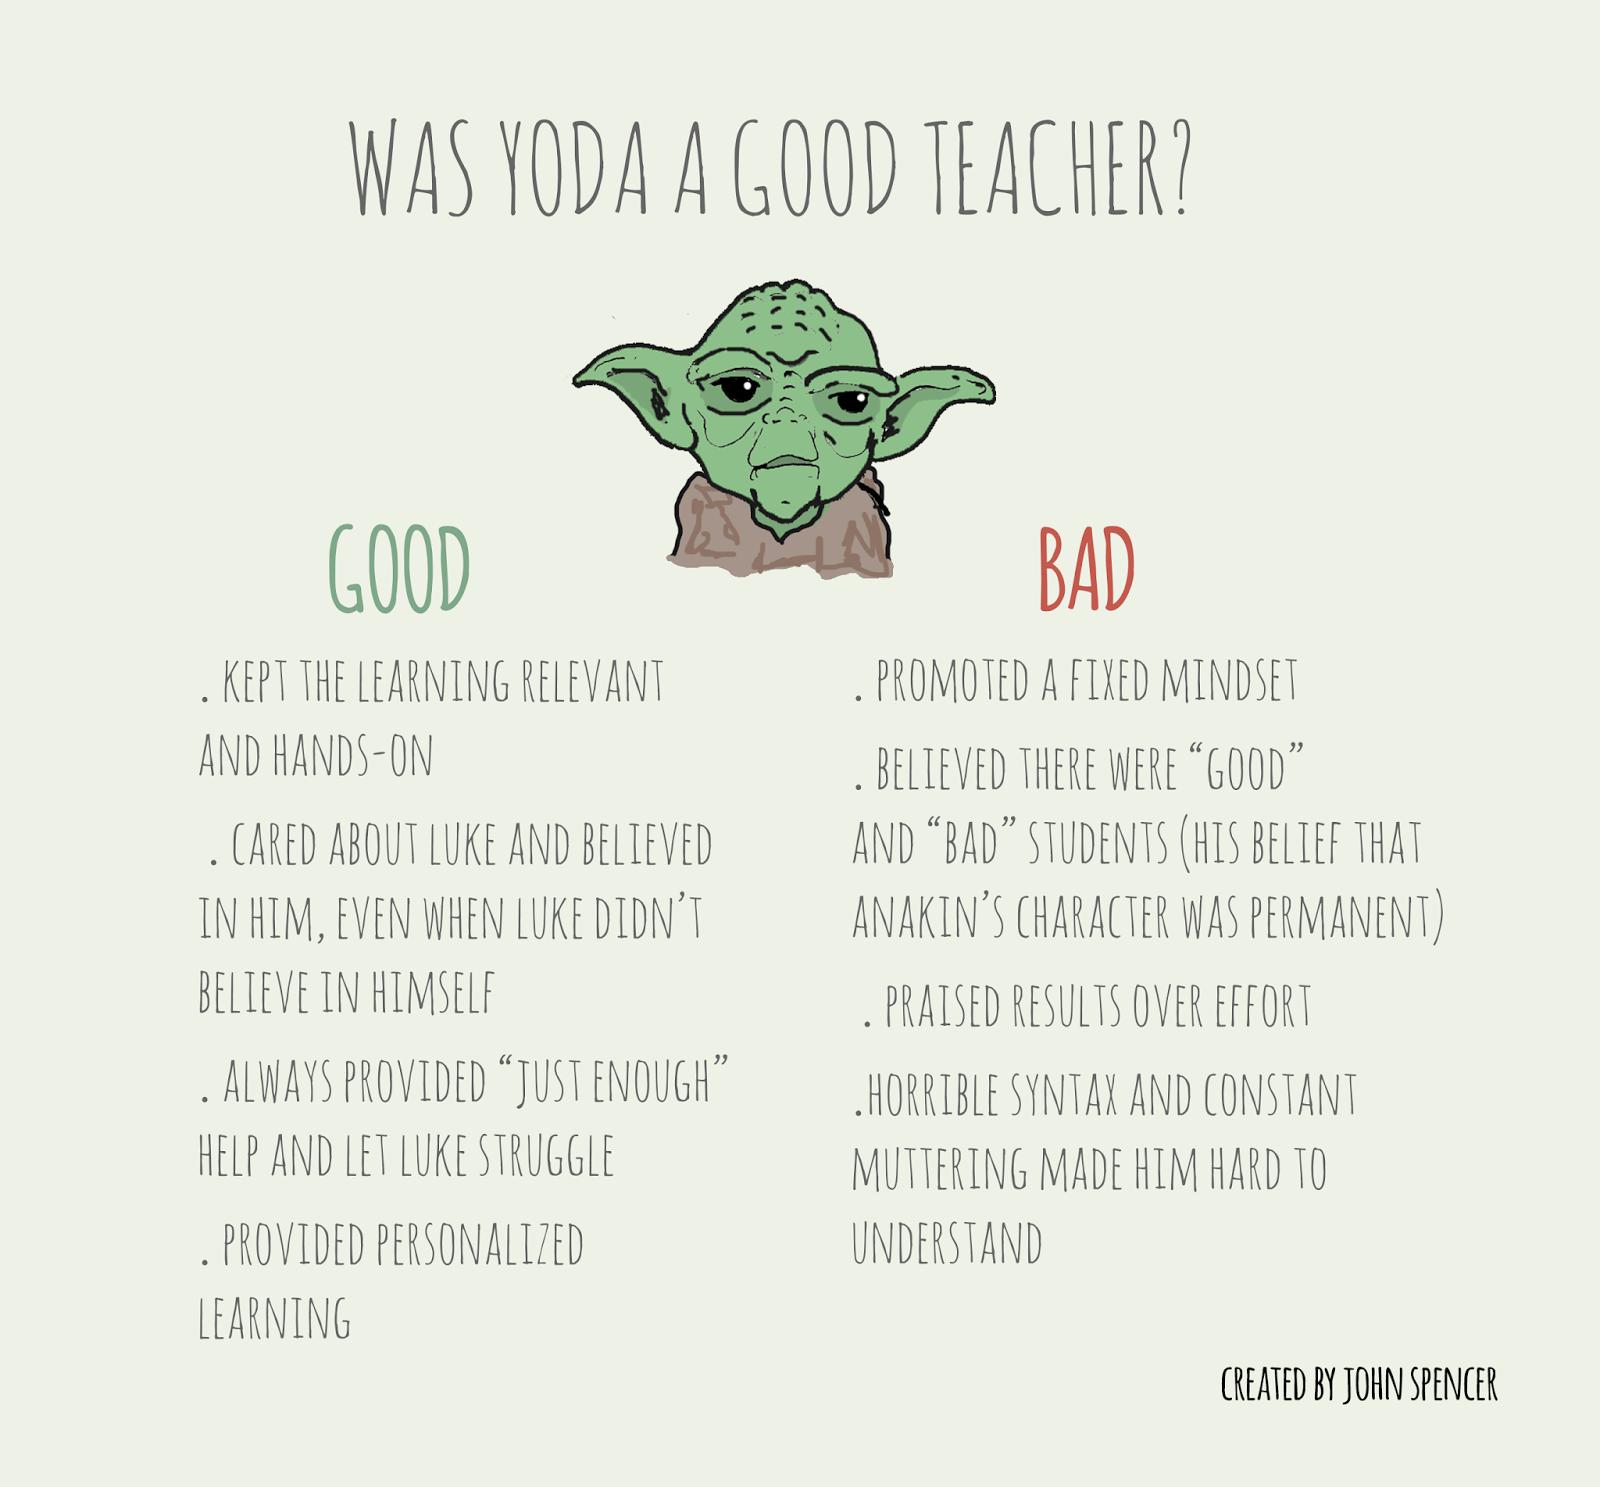 good teacher essay good person essay how to write a good  was yoda a good teacher john spencer why yoda was an bad teacher